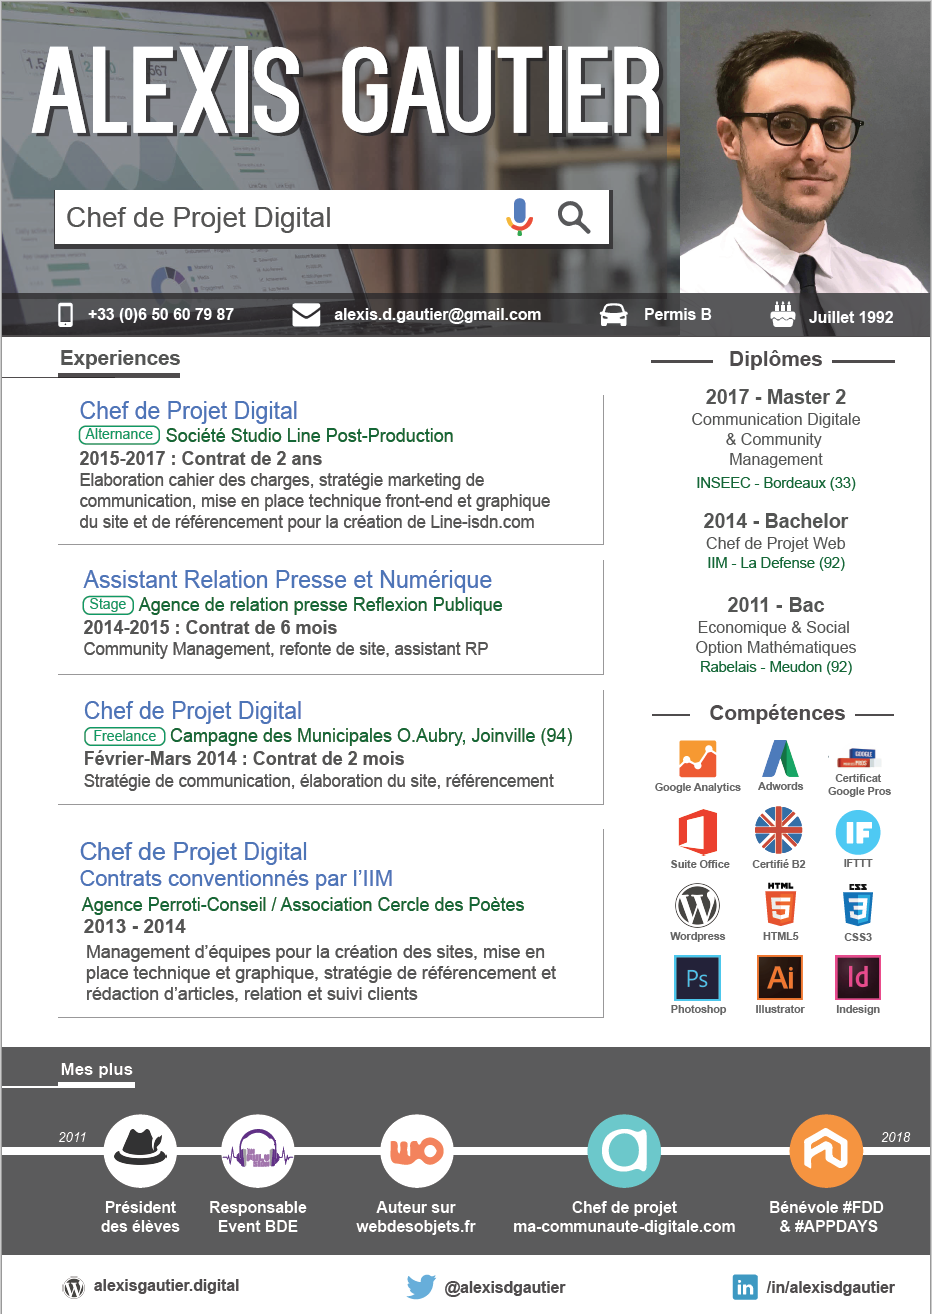 Étonnant Chef de Projet Digital Junior | Chef de projet digital, Cv digital XU-17